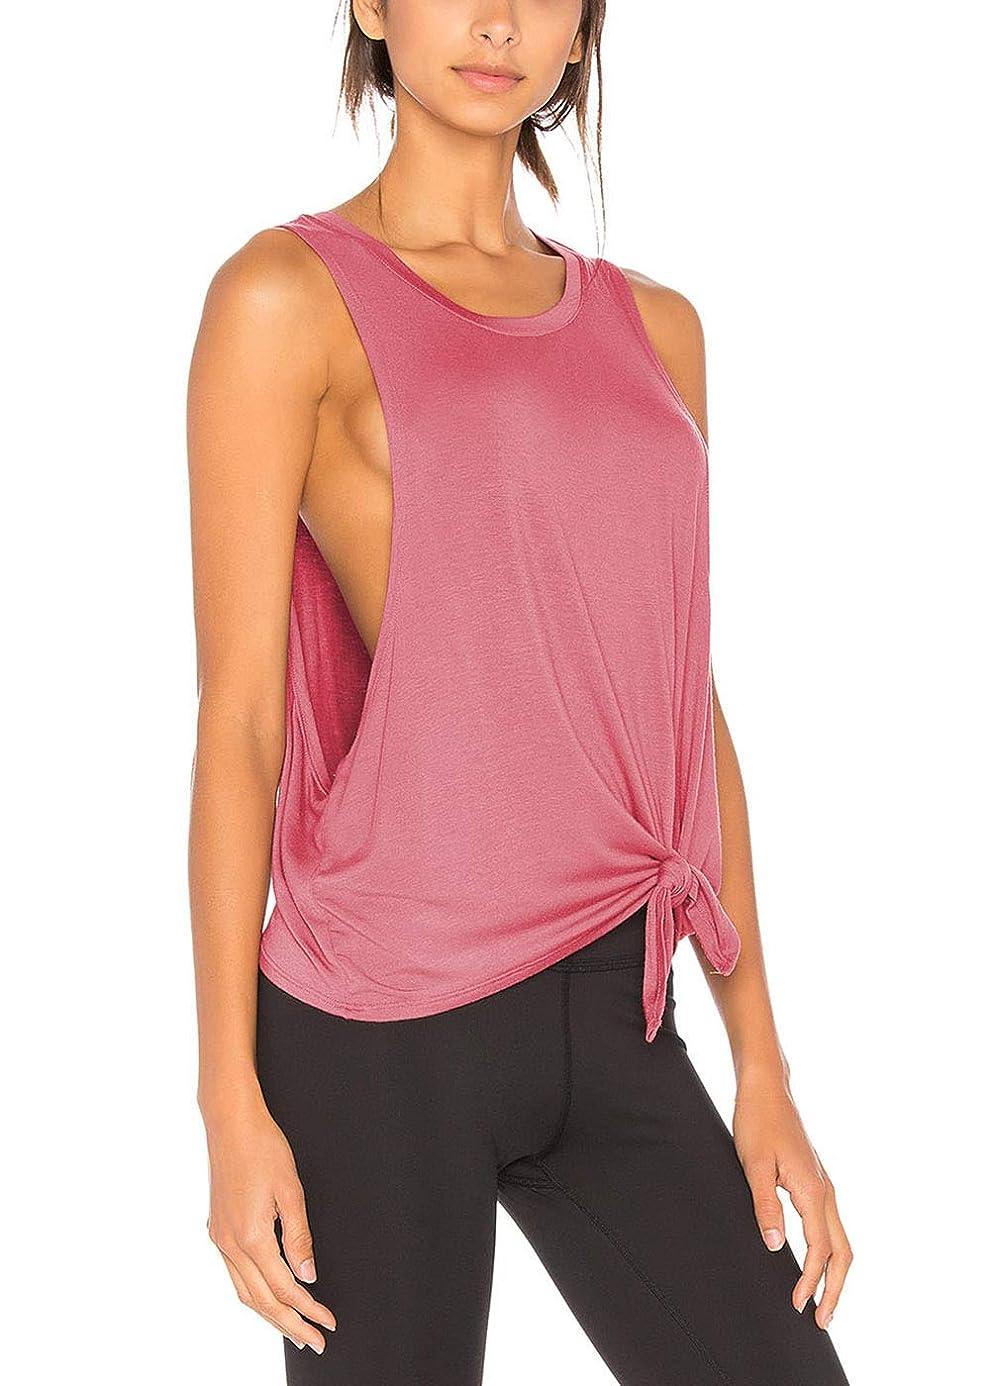 Bestisun Cute Workout Yoga Top Fitness Sport Shirts Tie Knot Activewear Tank for Sport Women